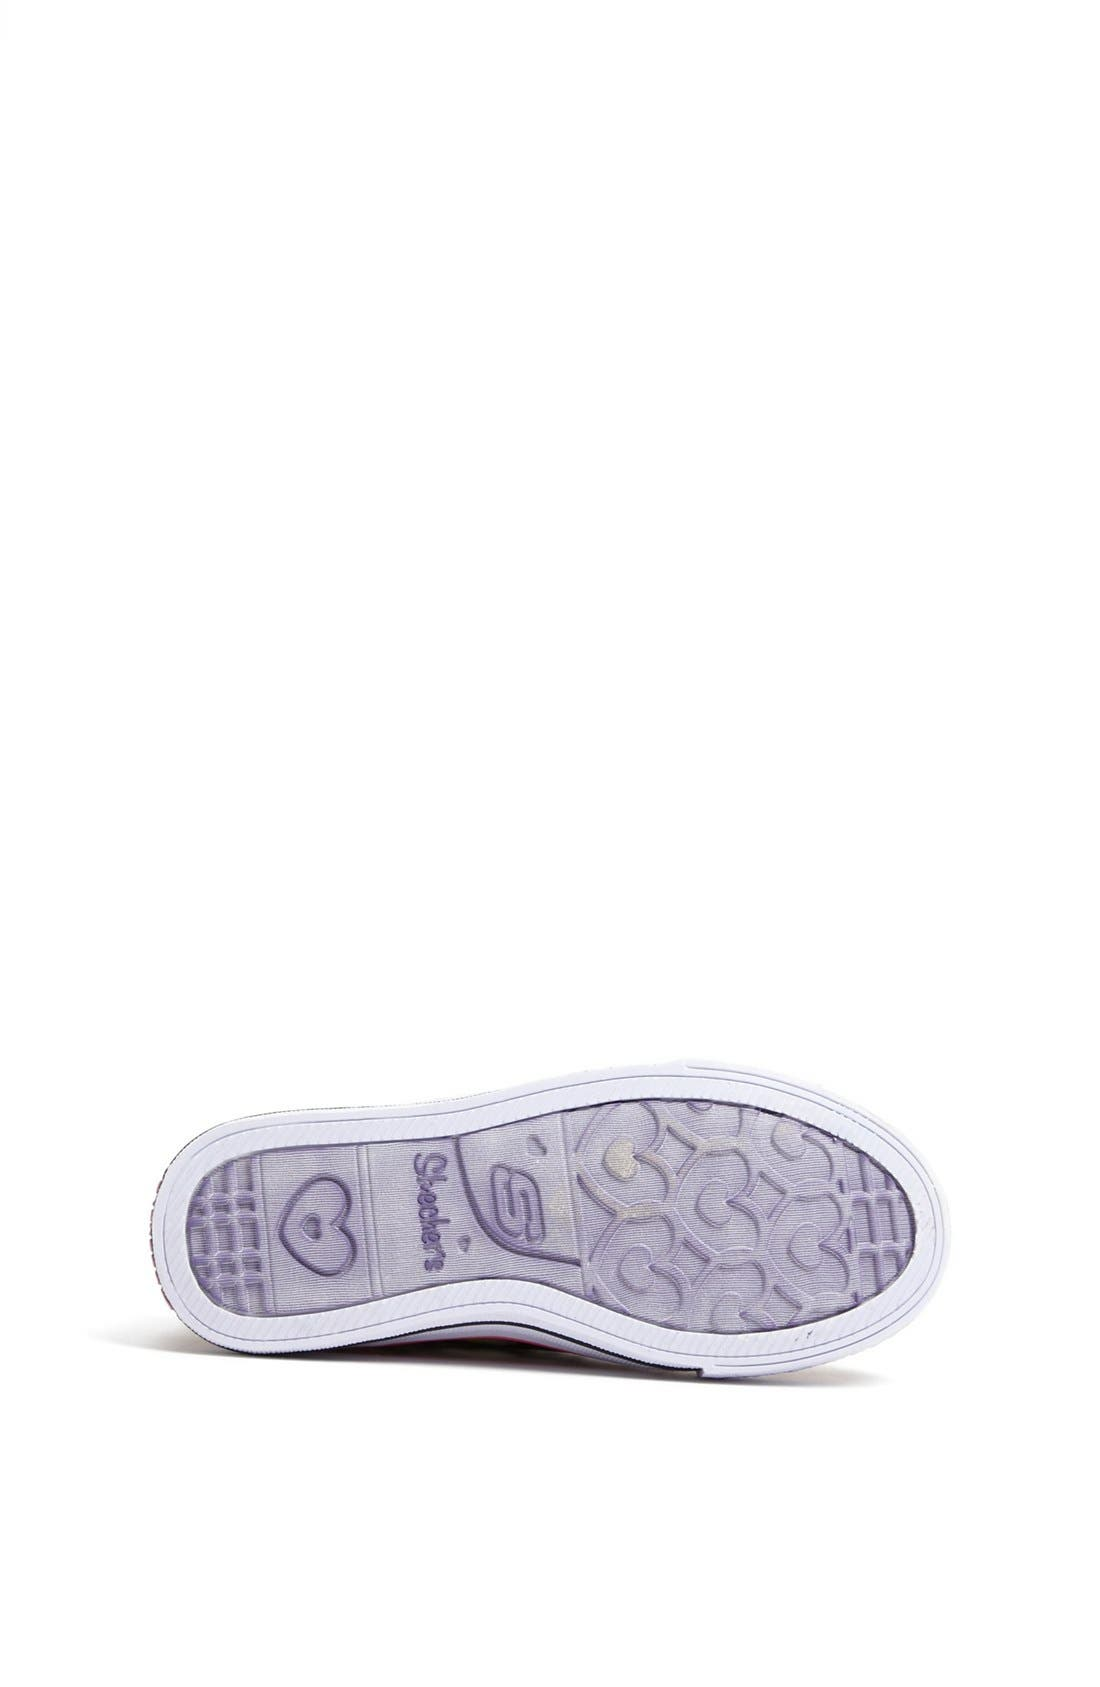 Alternate Image 4  - SKECHERS 'Twinkle Toes' Light-Up Sneaker (Toddler & Little Kid)